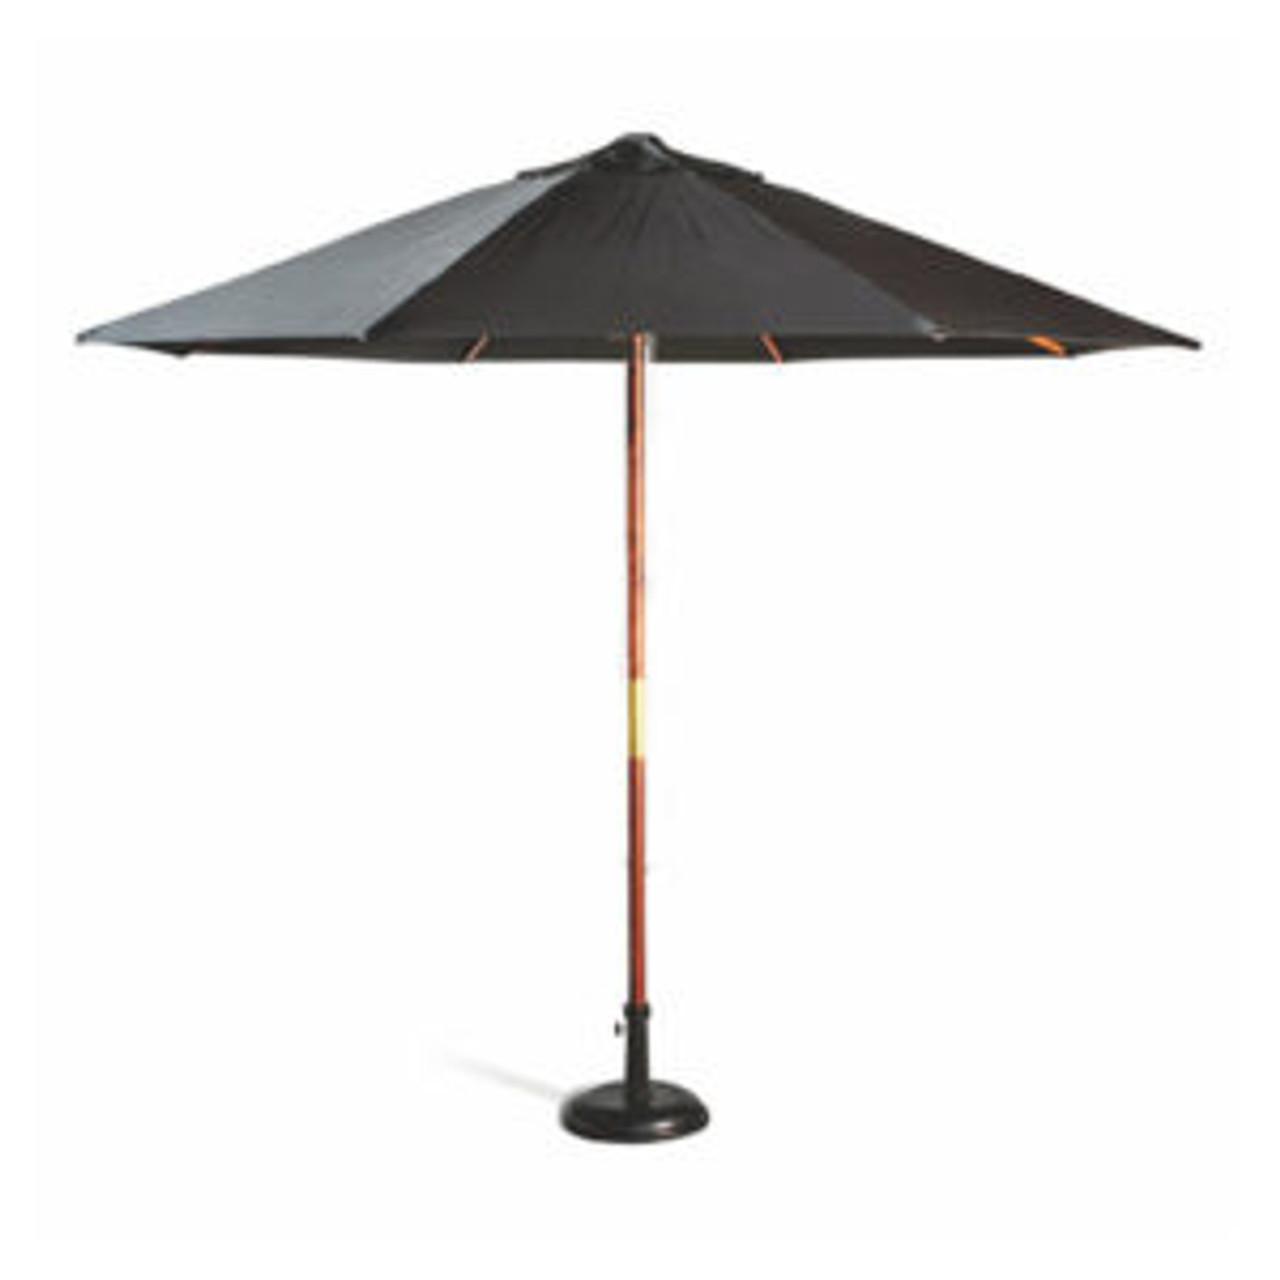 2.5m Market Umbrella - Wooden Frame with  Olefin Shade